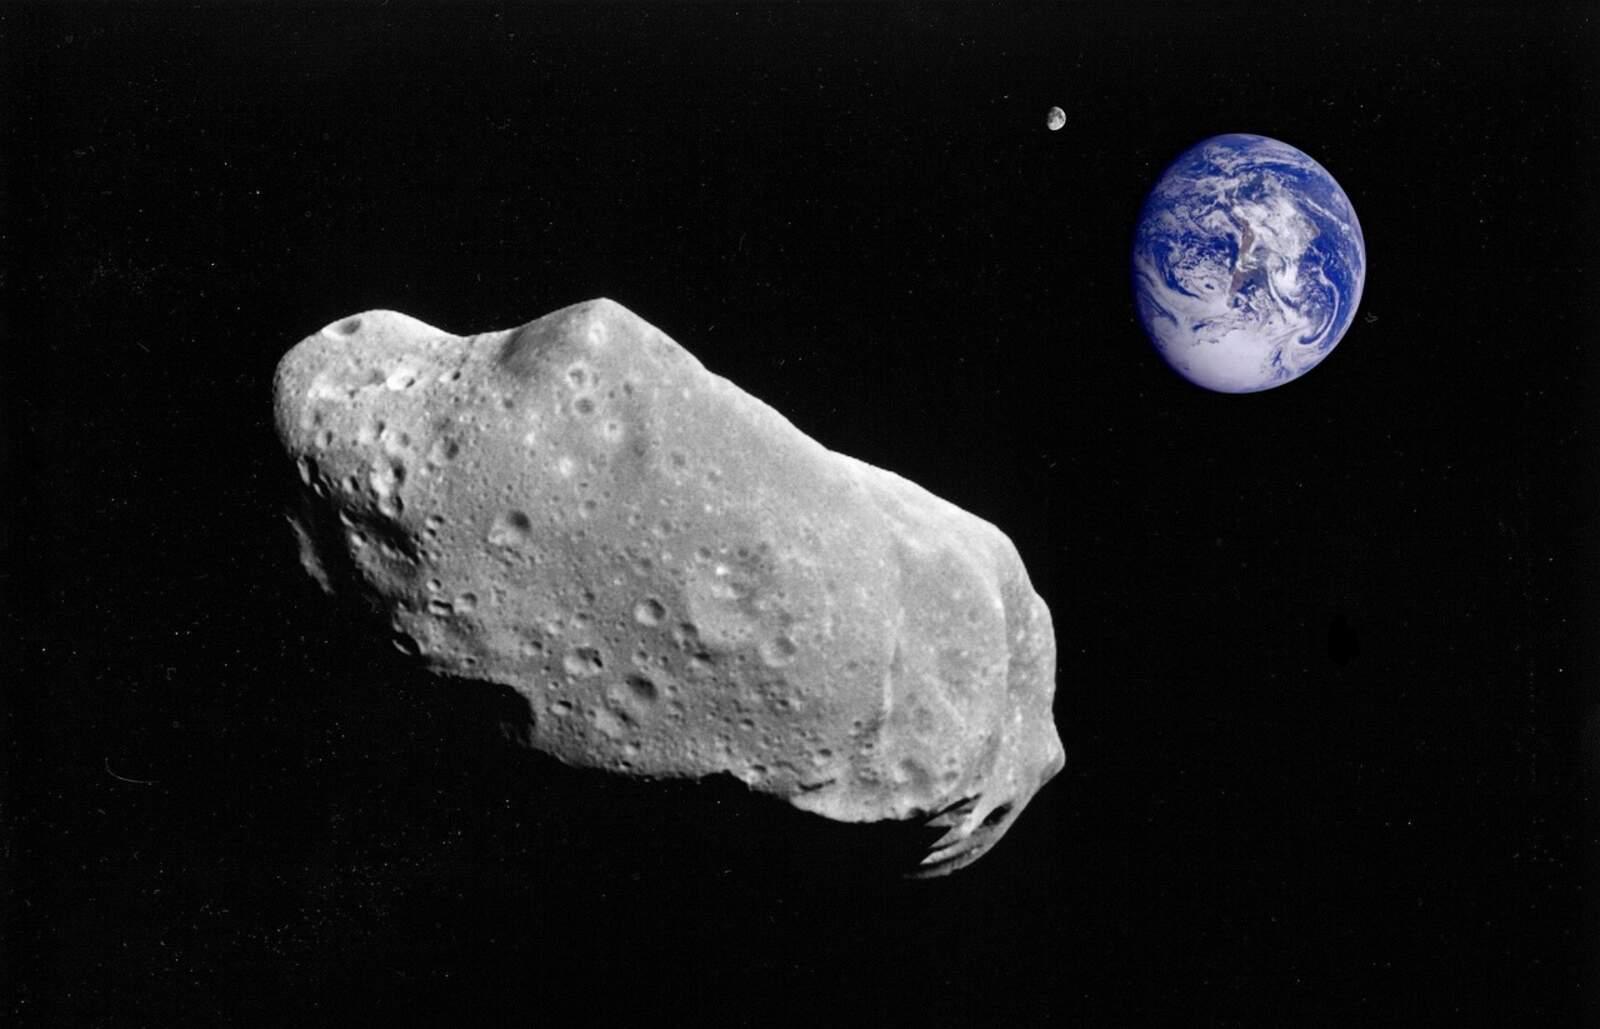 Asteroide dirigint-se a la Terra